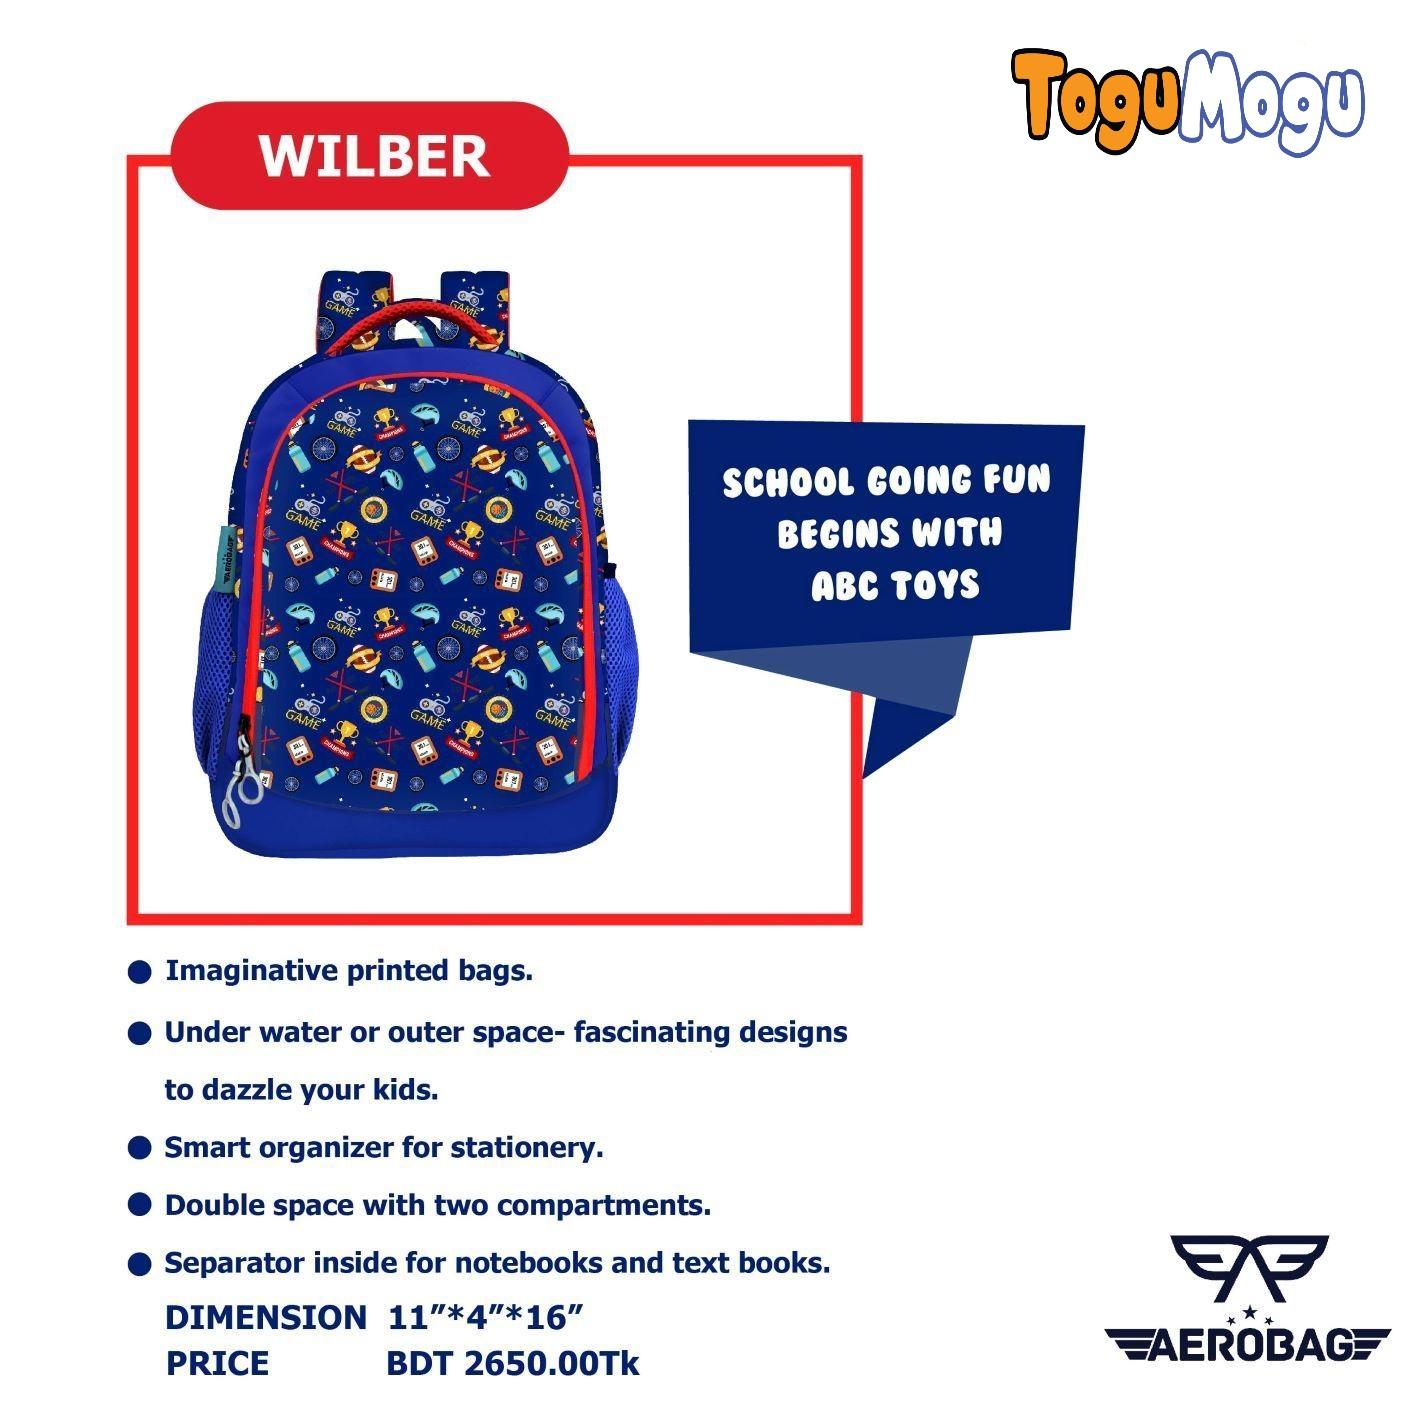 AEROBAG AER023 Wilber Sport